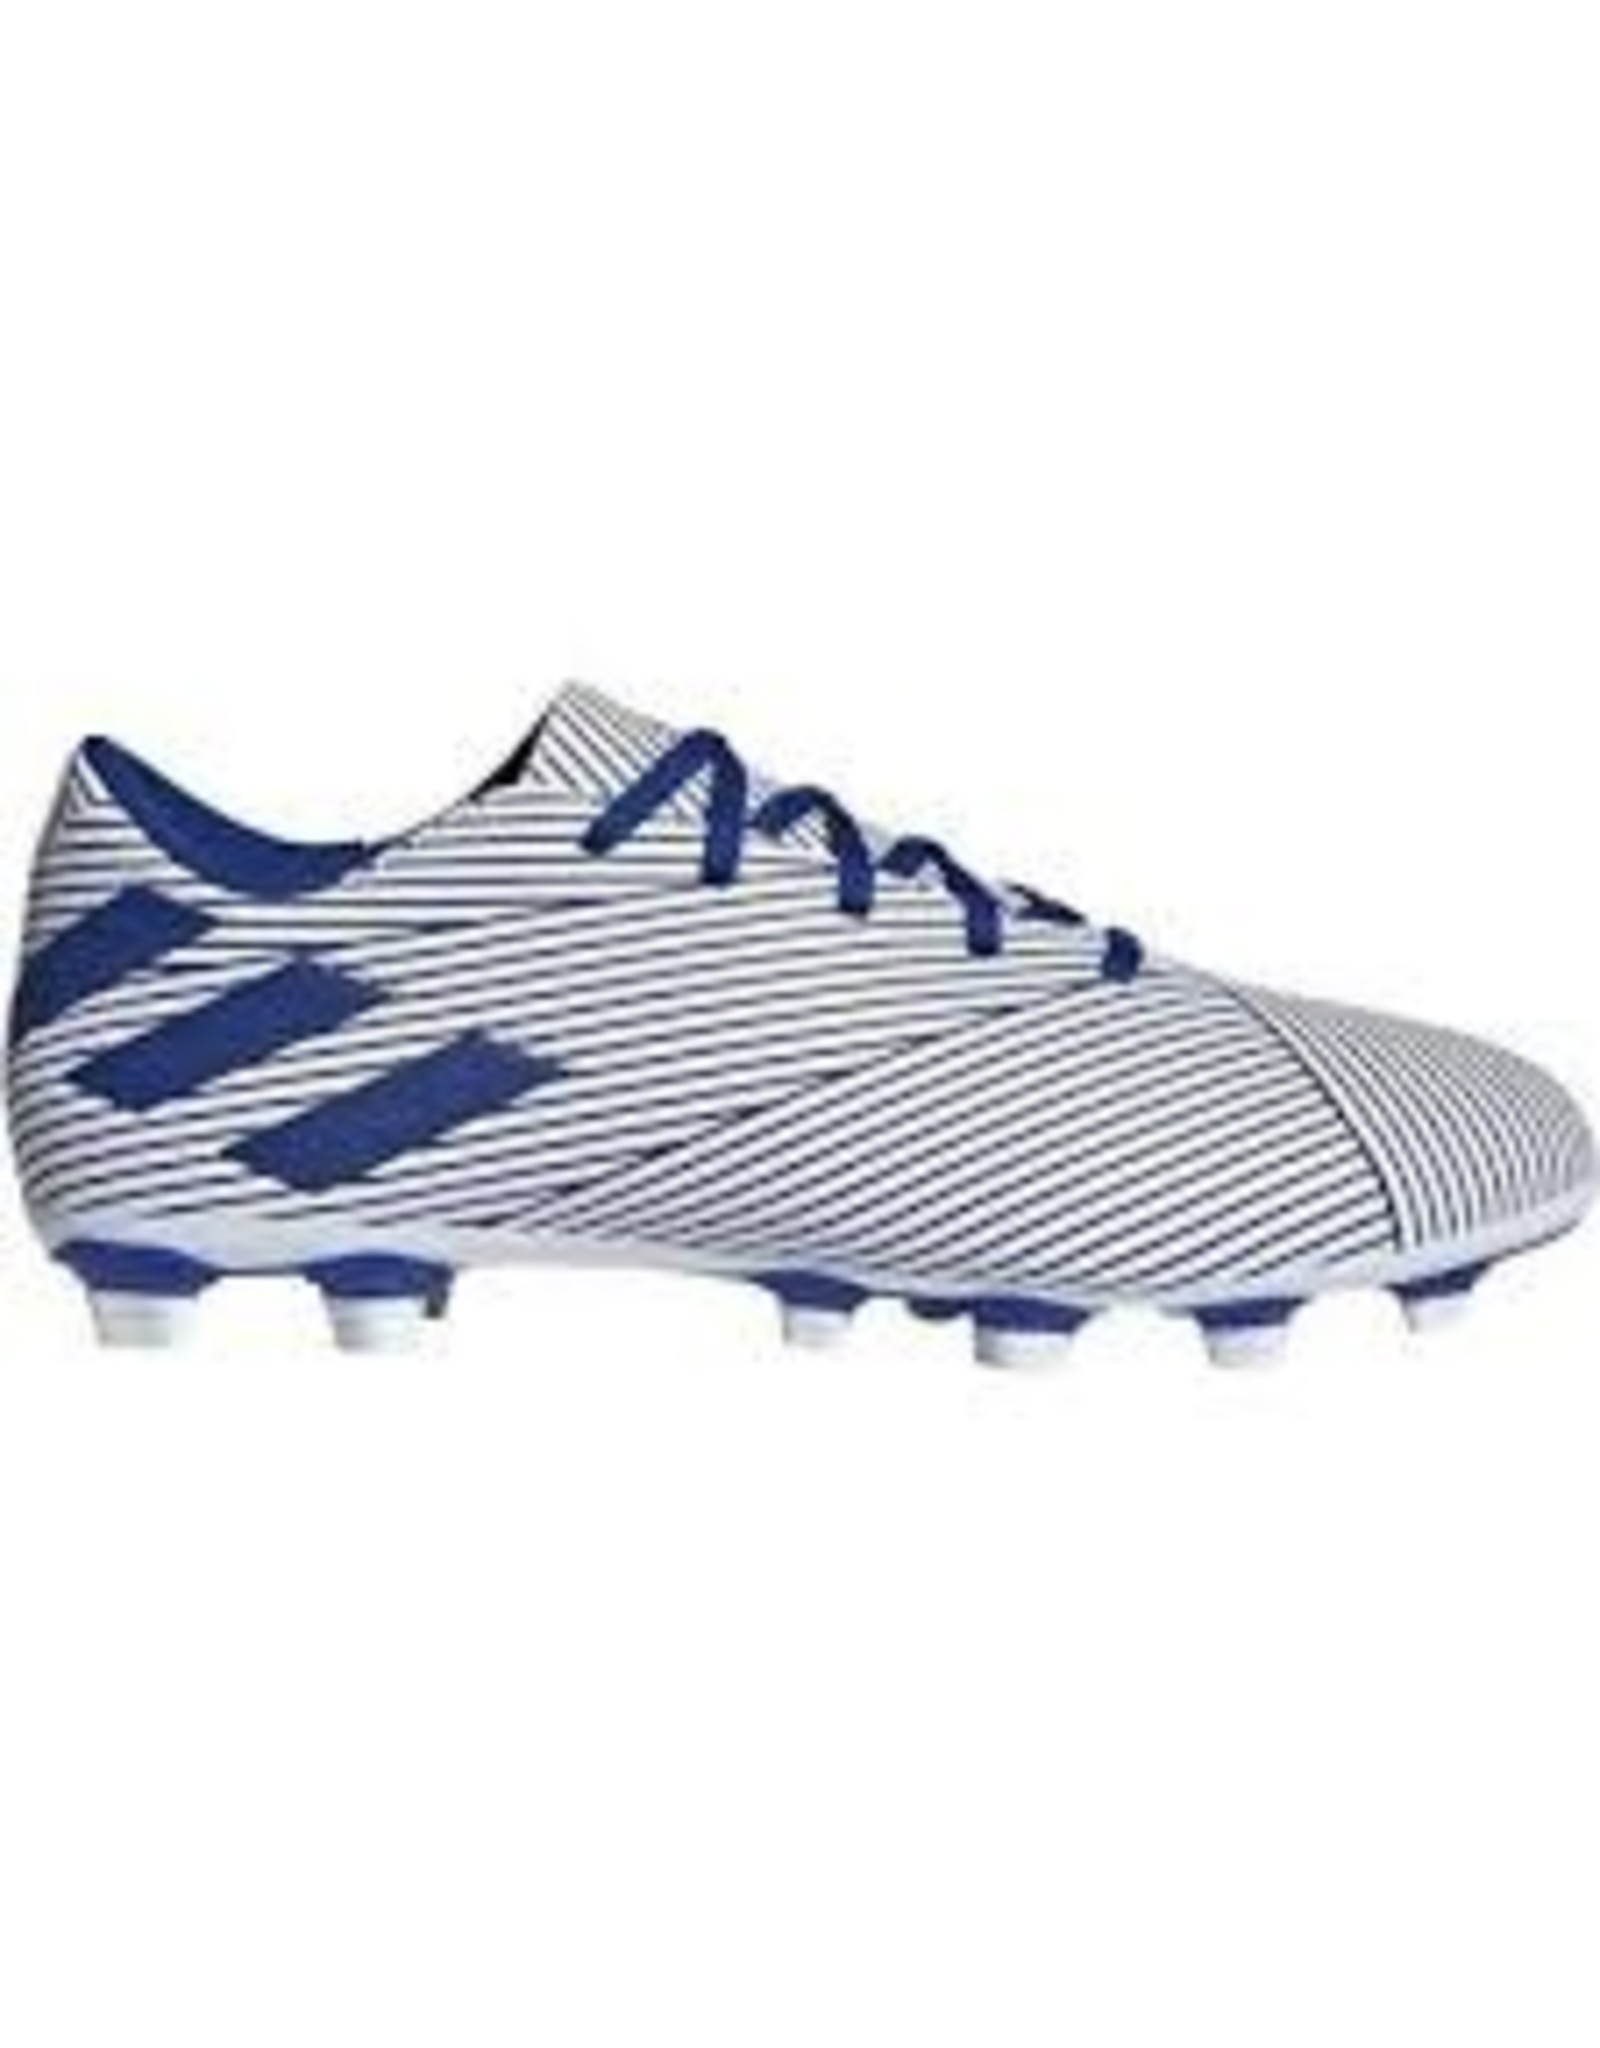 Adidas Adidas NEMEZIZ 19.4 FxG Junior Cleats (FTWWHT/ROYBLU/CBLACK)